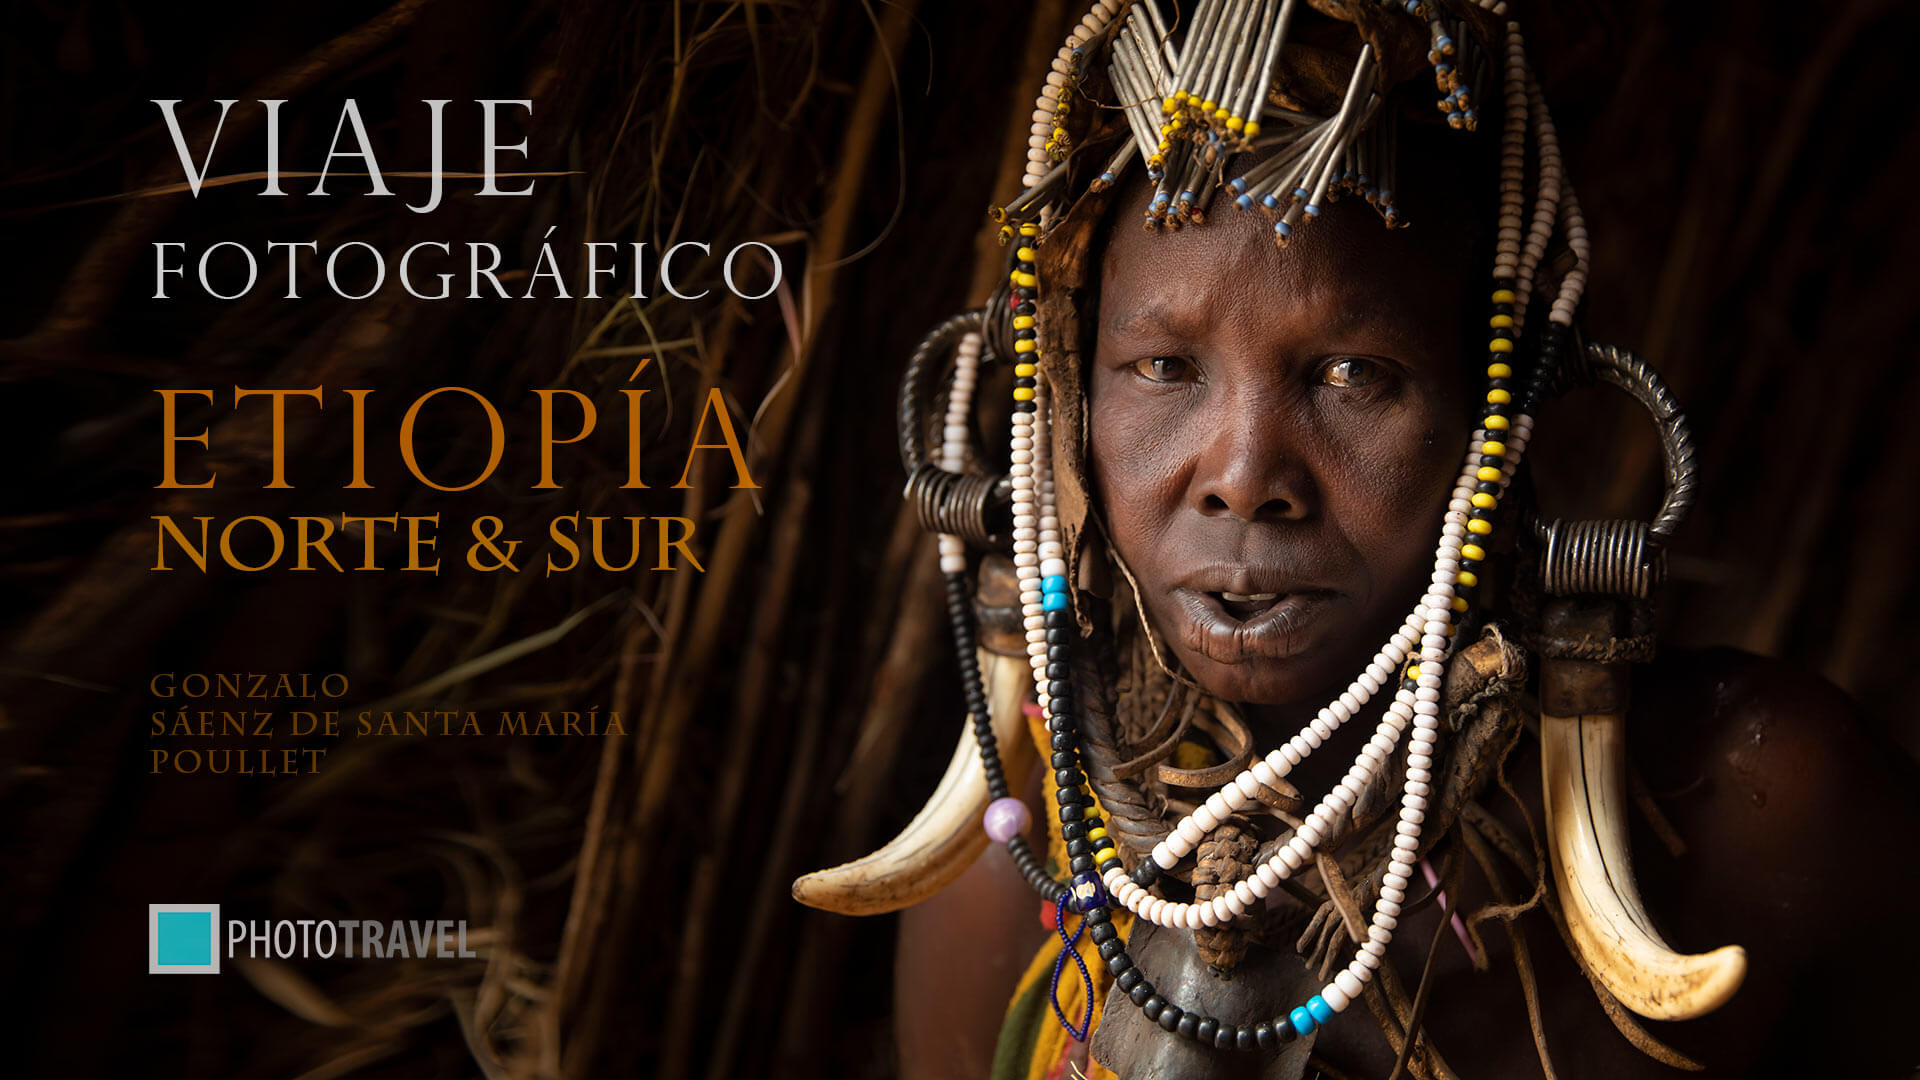 Viaje Fotografíco a Etiopia